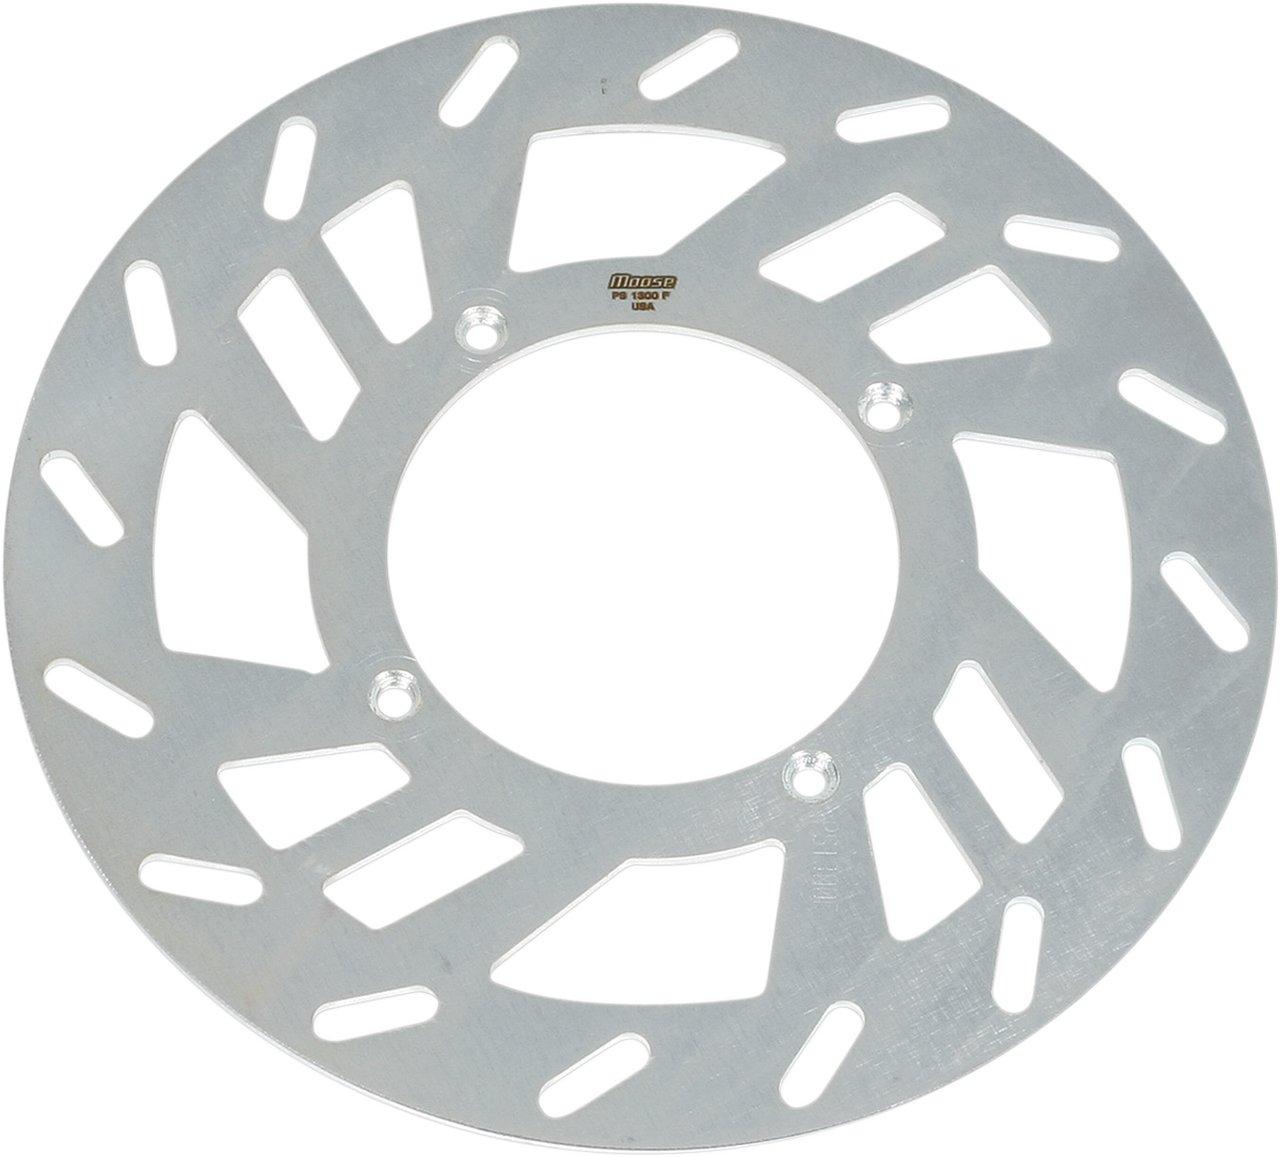 【MOOSE RACING】原廠維修用煞車碟盤 [M061-1300] - 「Webike-摩托百貨」